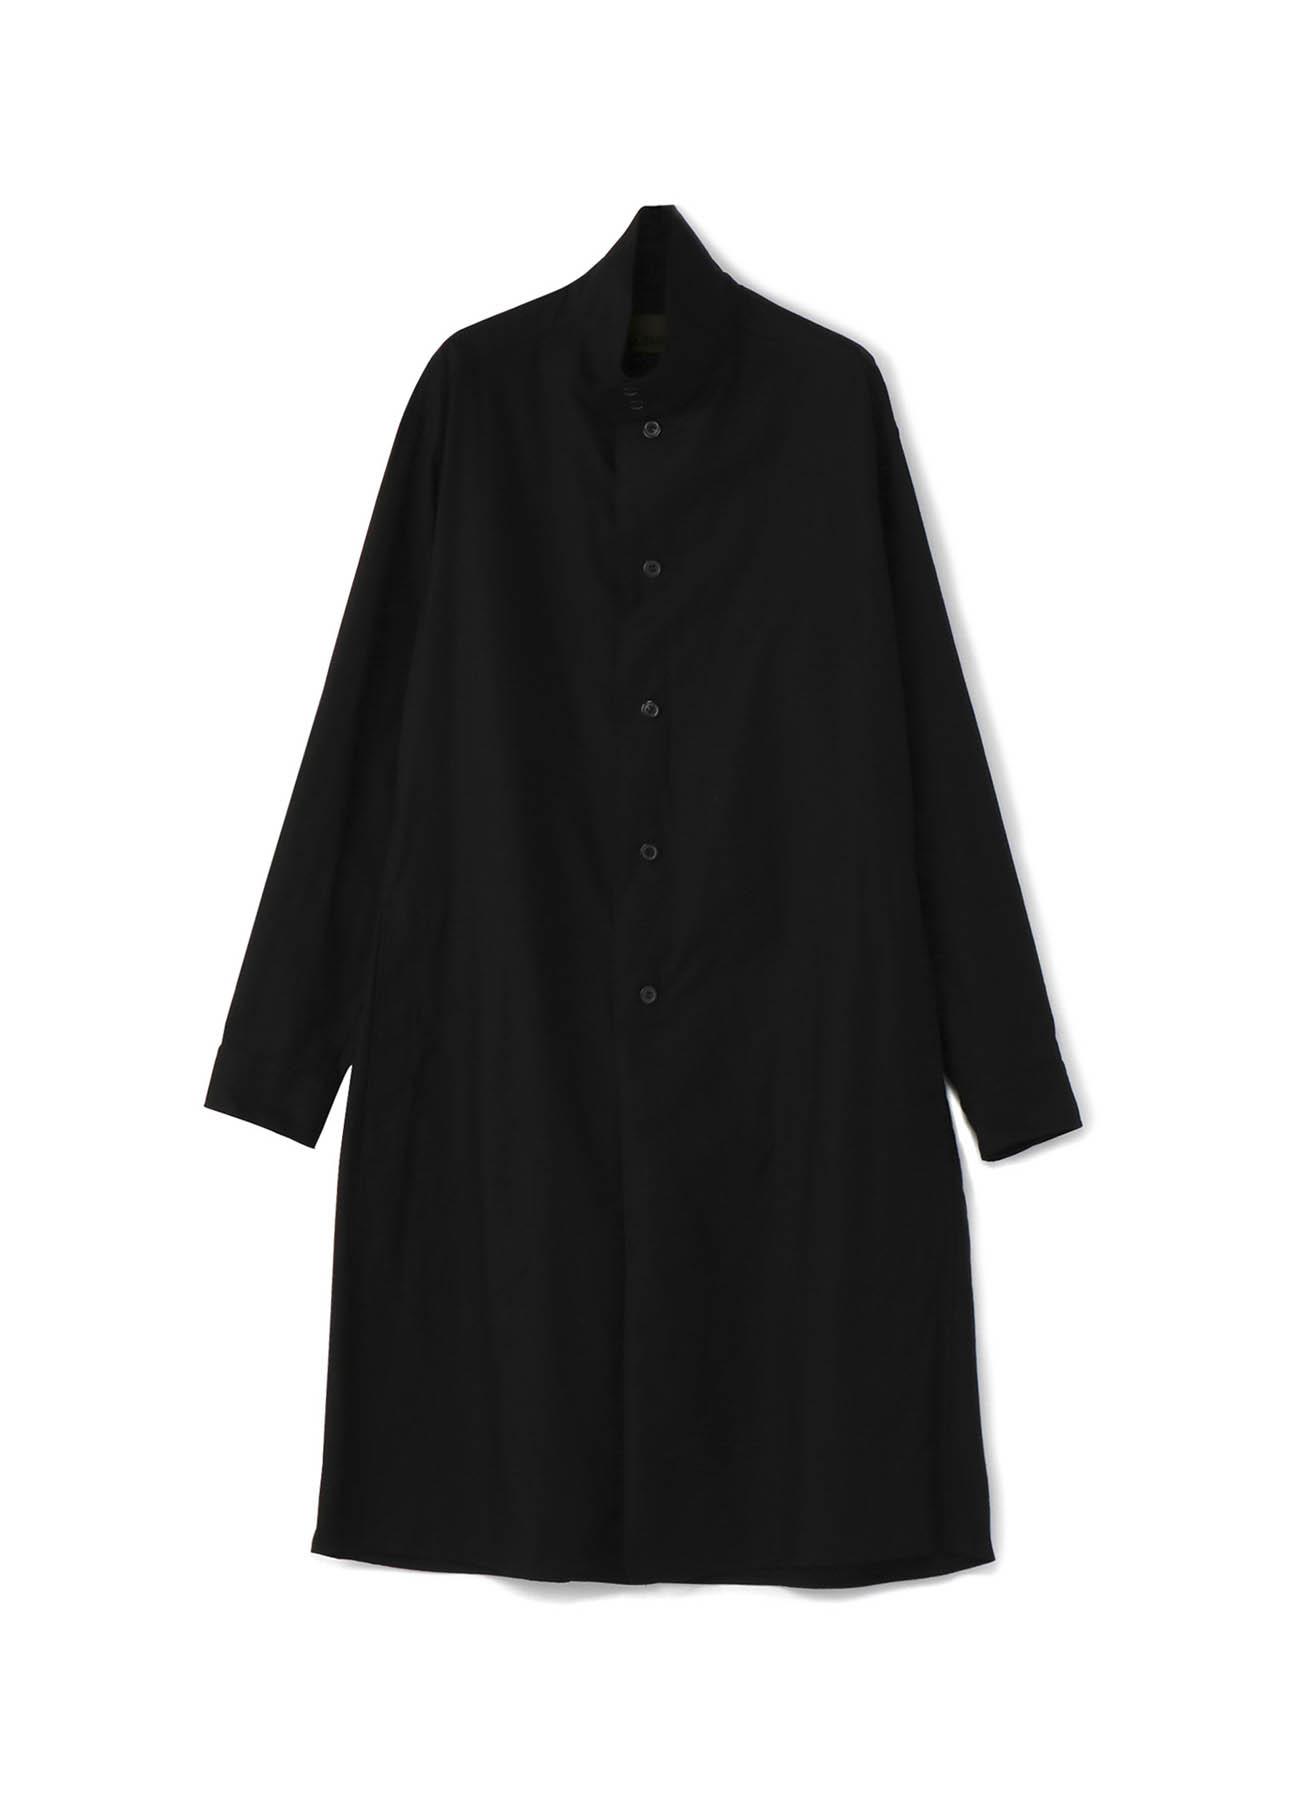 No.5 Long Shirt Coat Cotton Twill - Thin